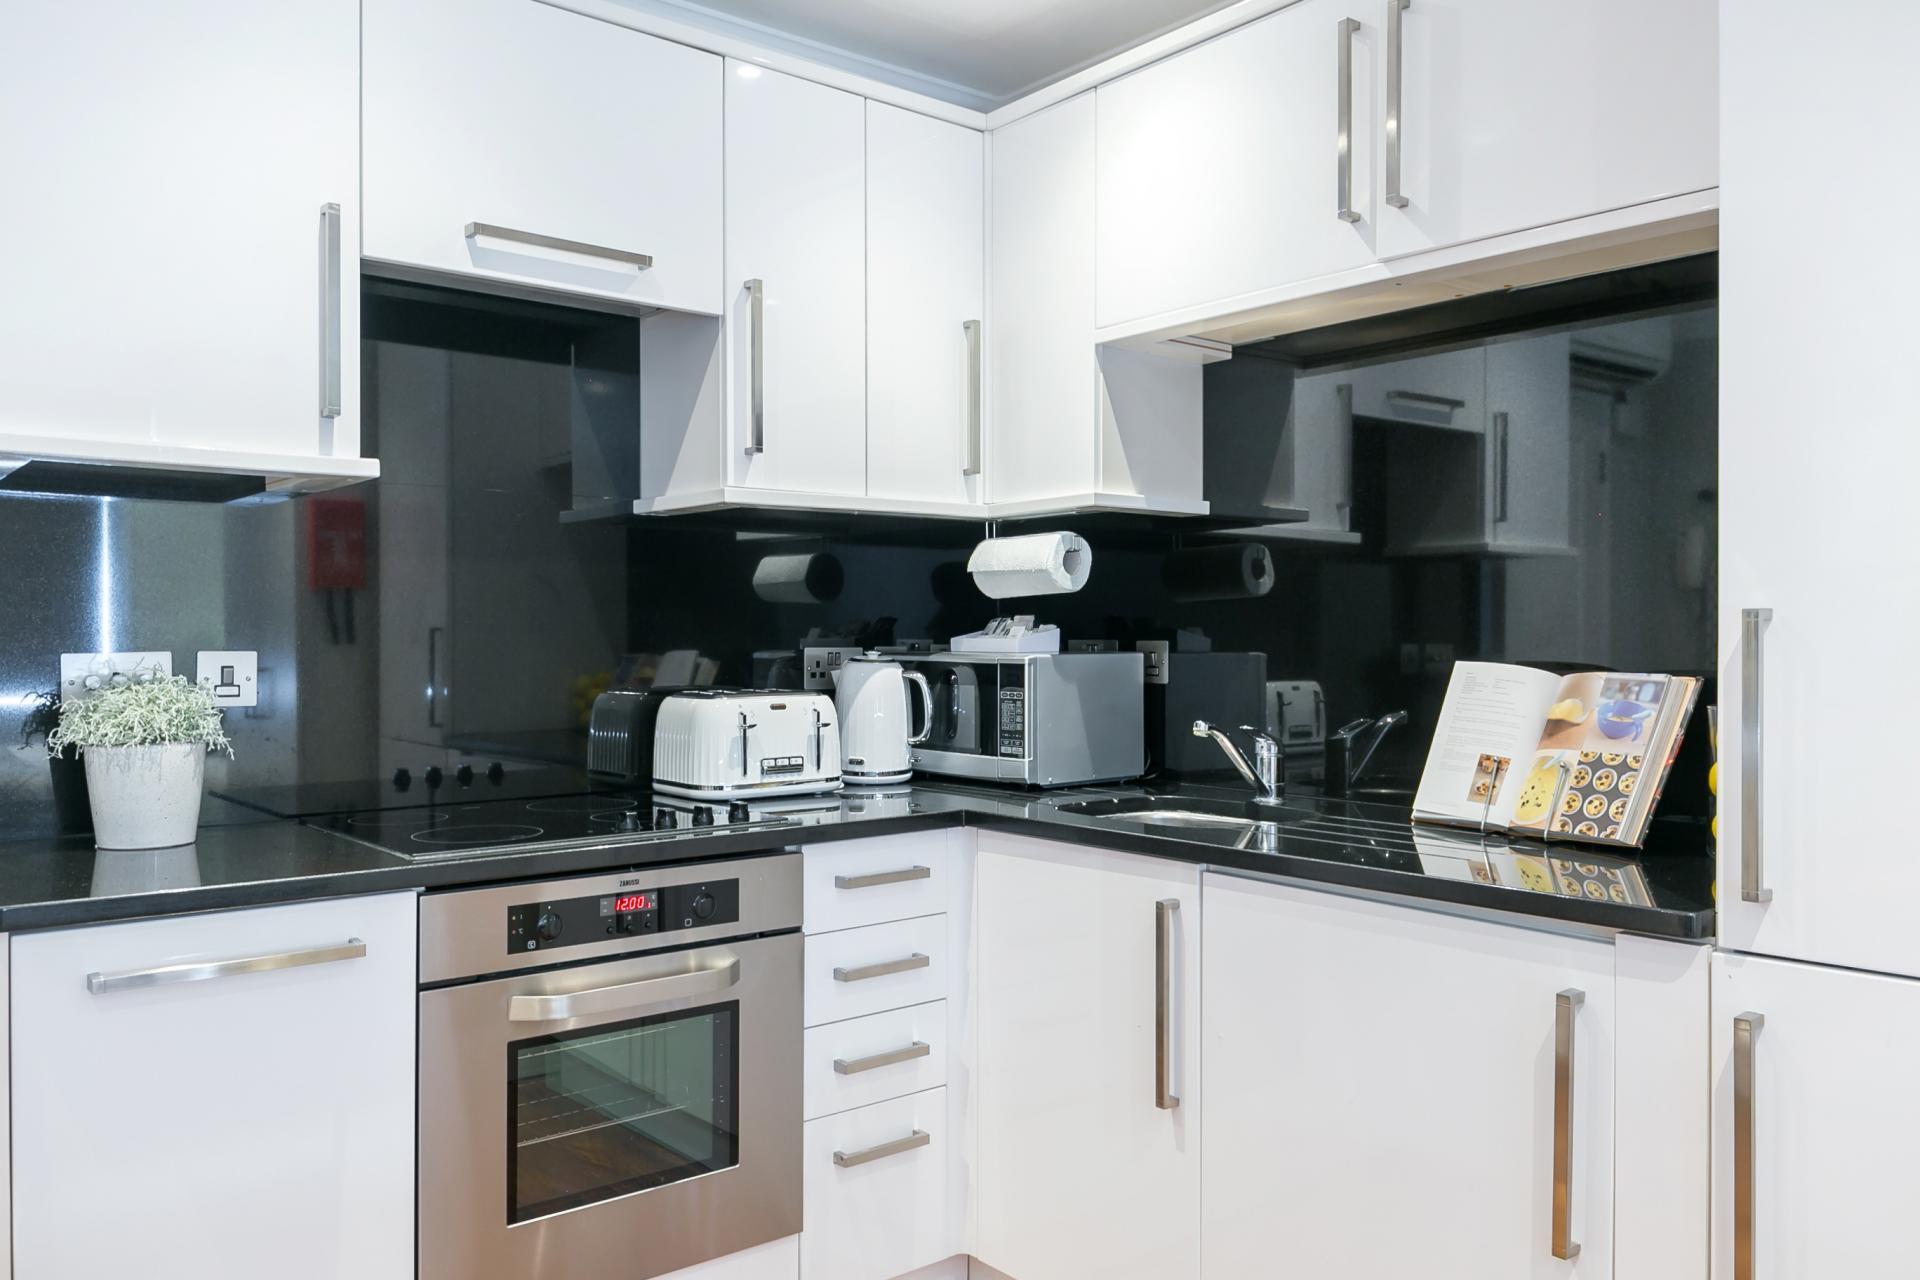 Kitchen at Chilworth Court Serviced Apartments, Paddington, London